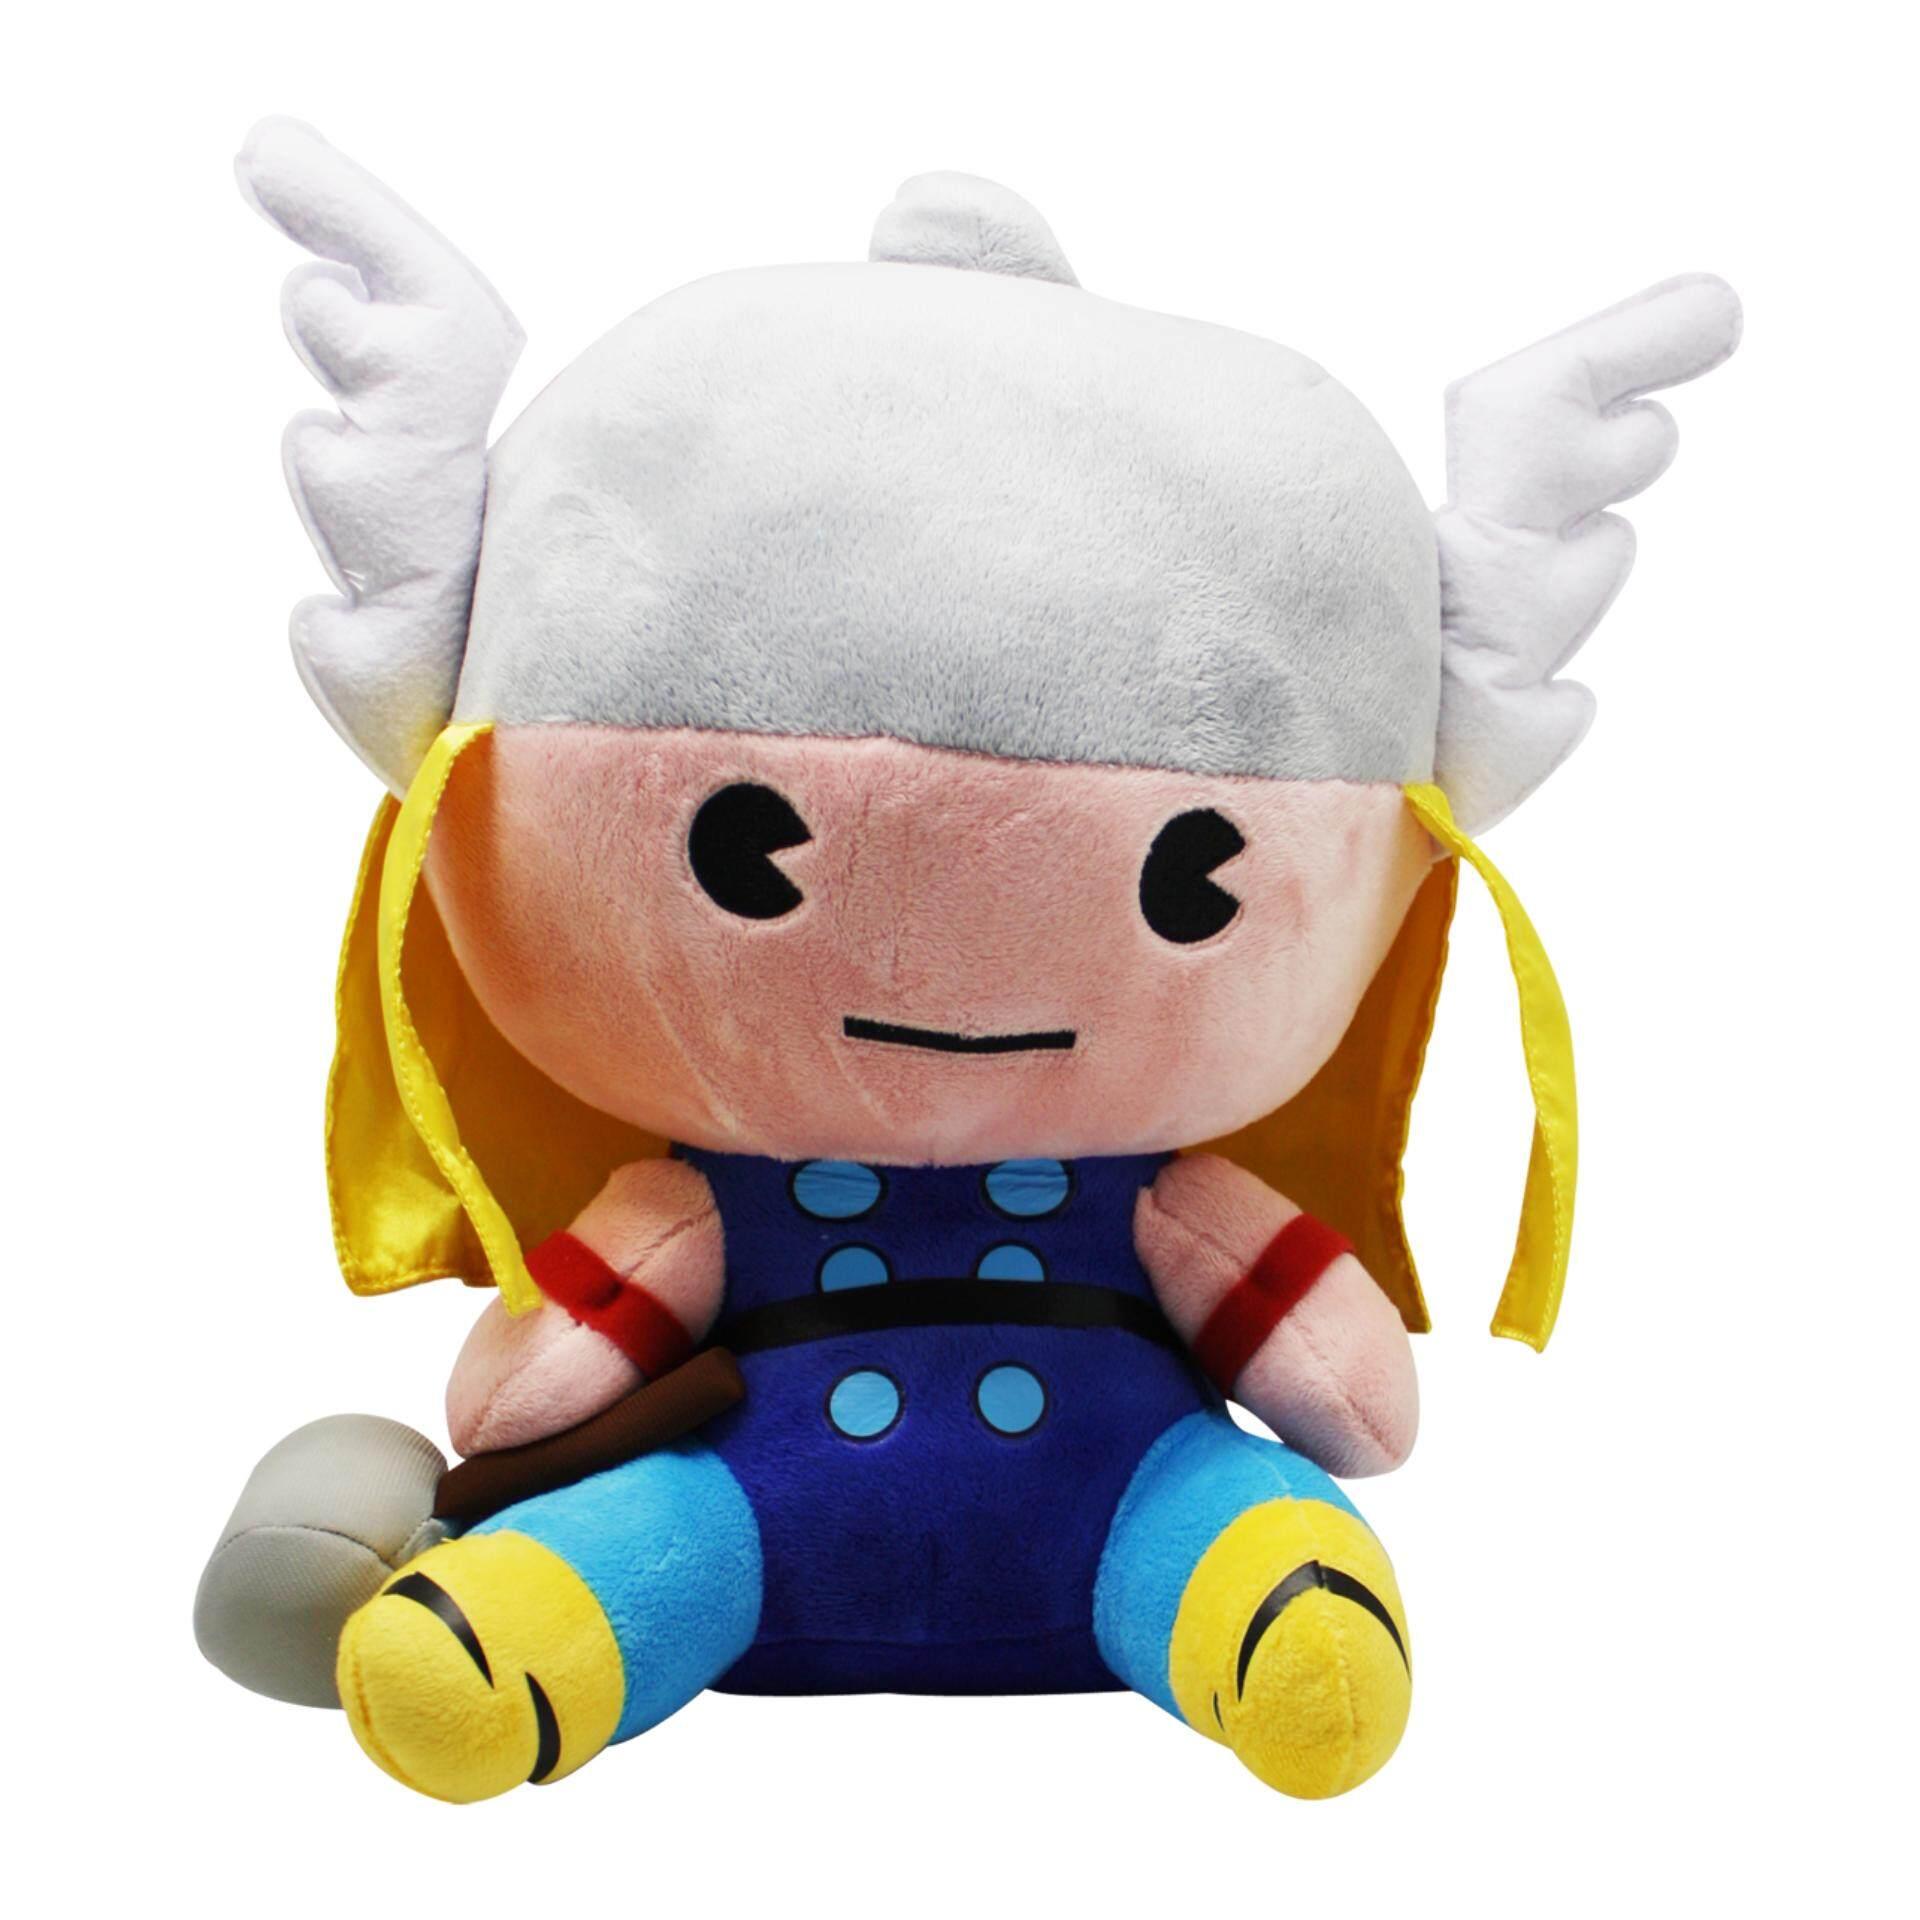 Marvel Avengers Kawaii Plush Toys 12 Inches - Thor